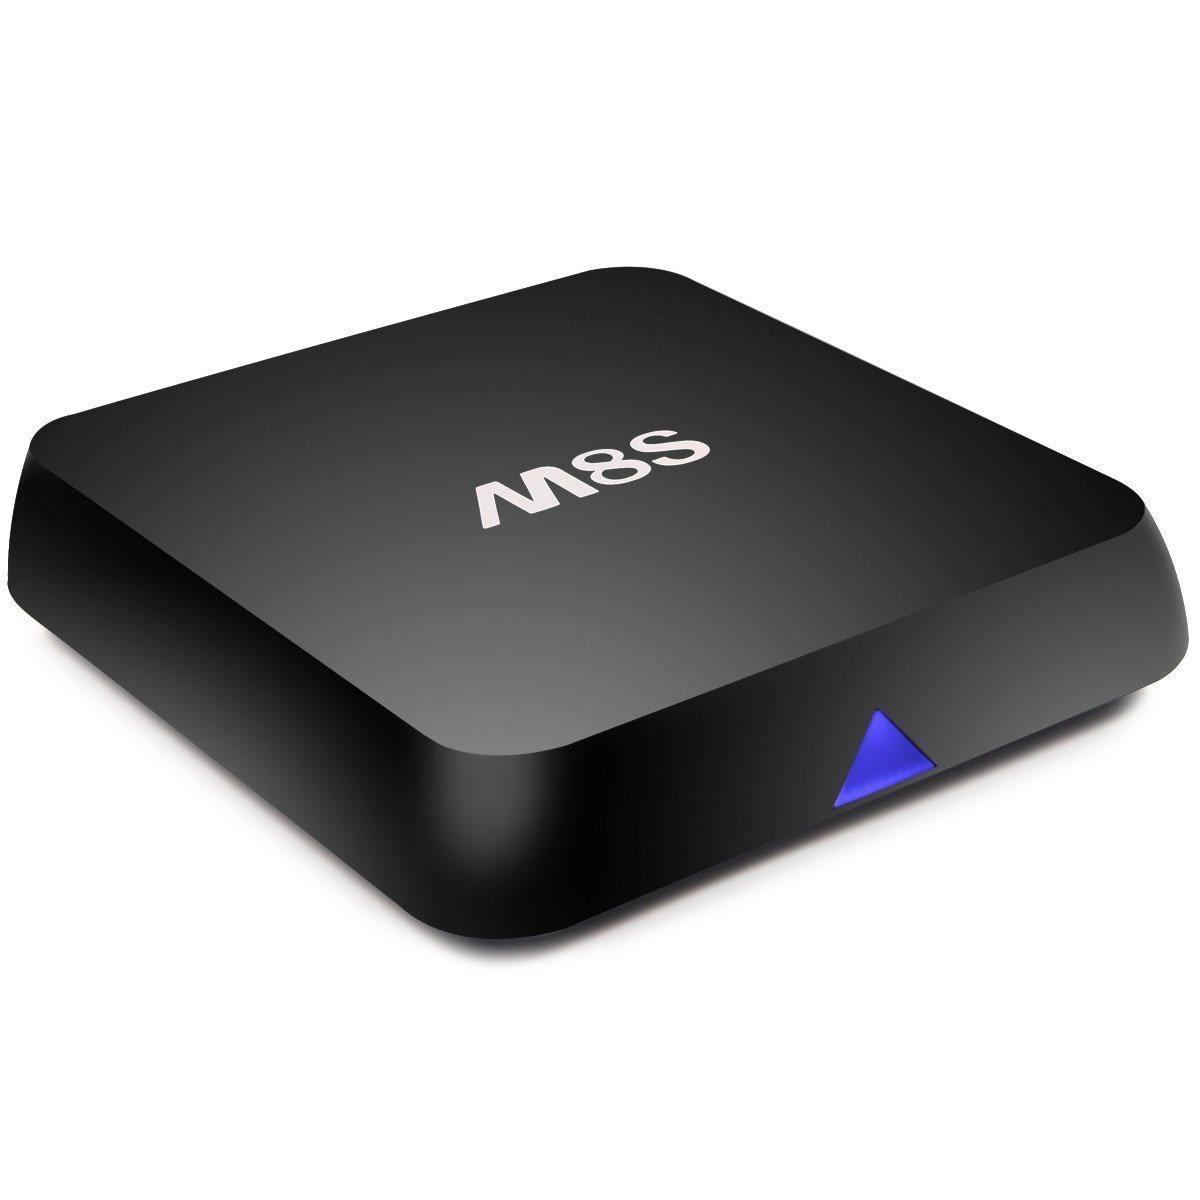 Lxx Android TV Box HD Internet TV Set Top Box